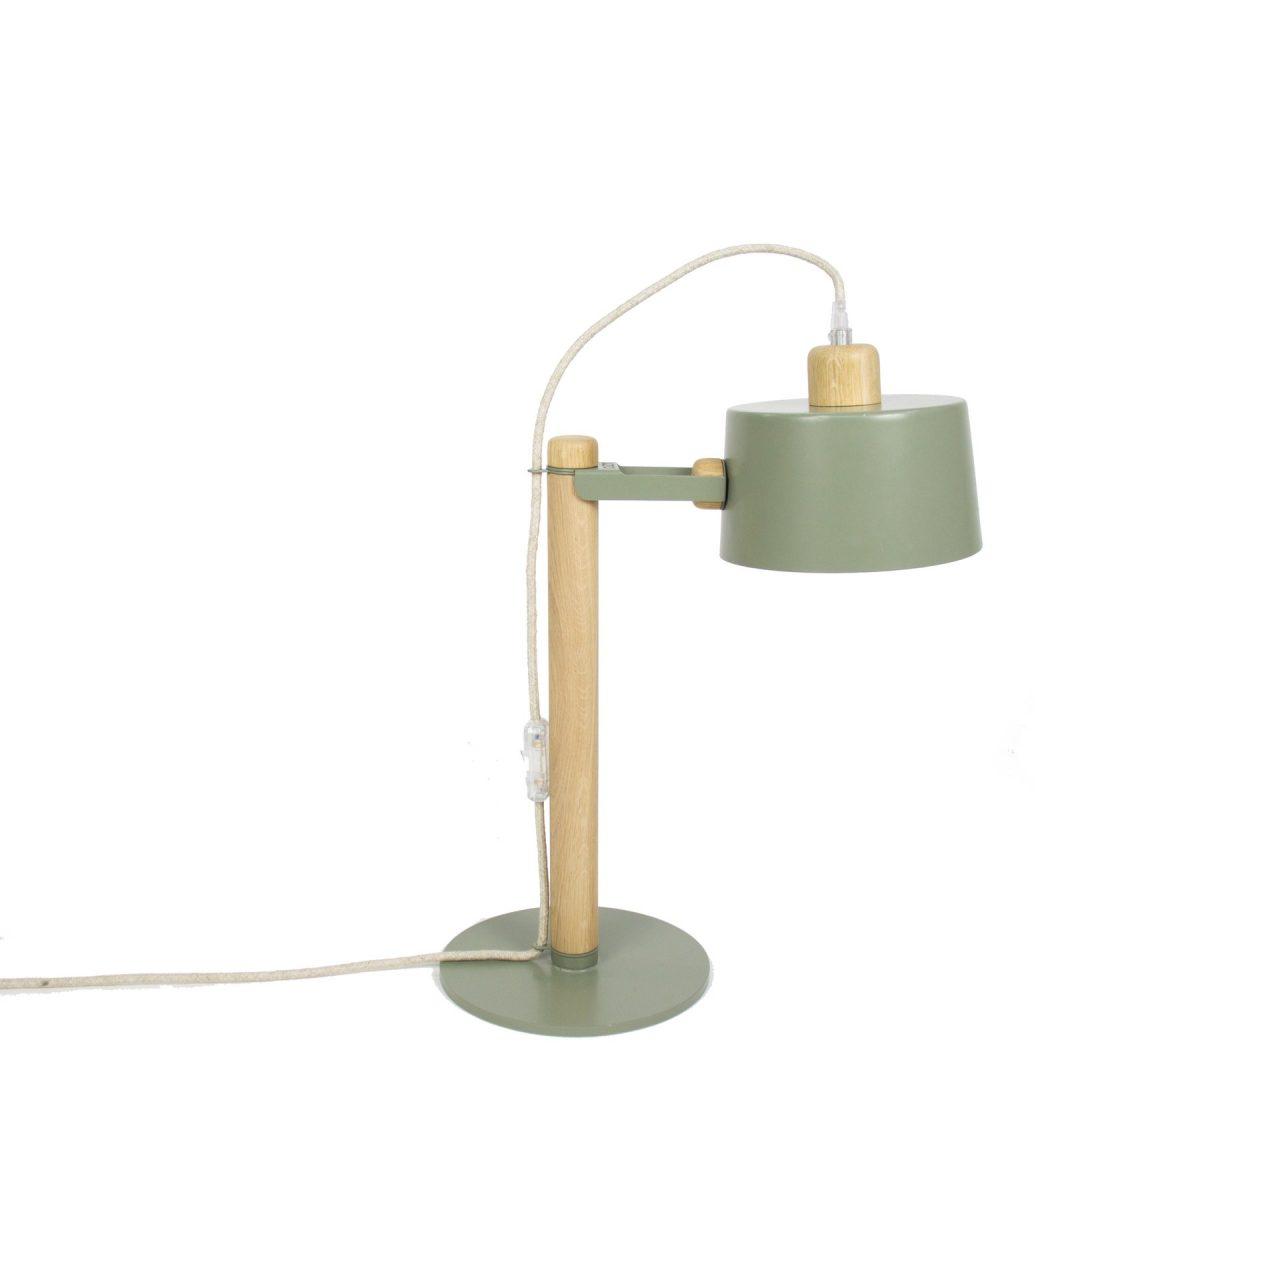 Lampe - lampe de bureau - lampe de chevet. Fabrication française.